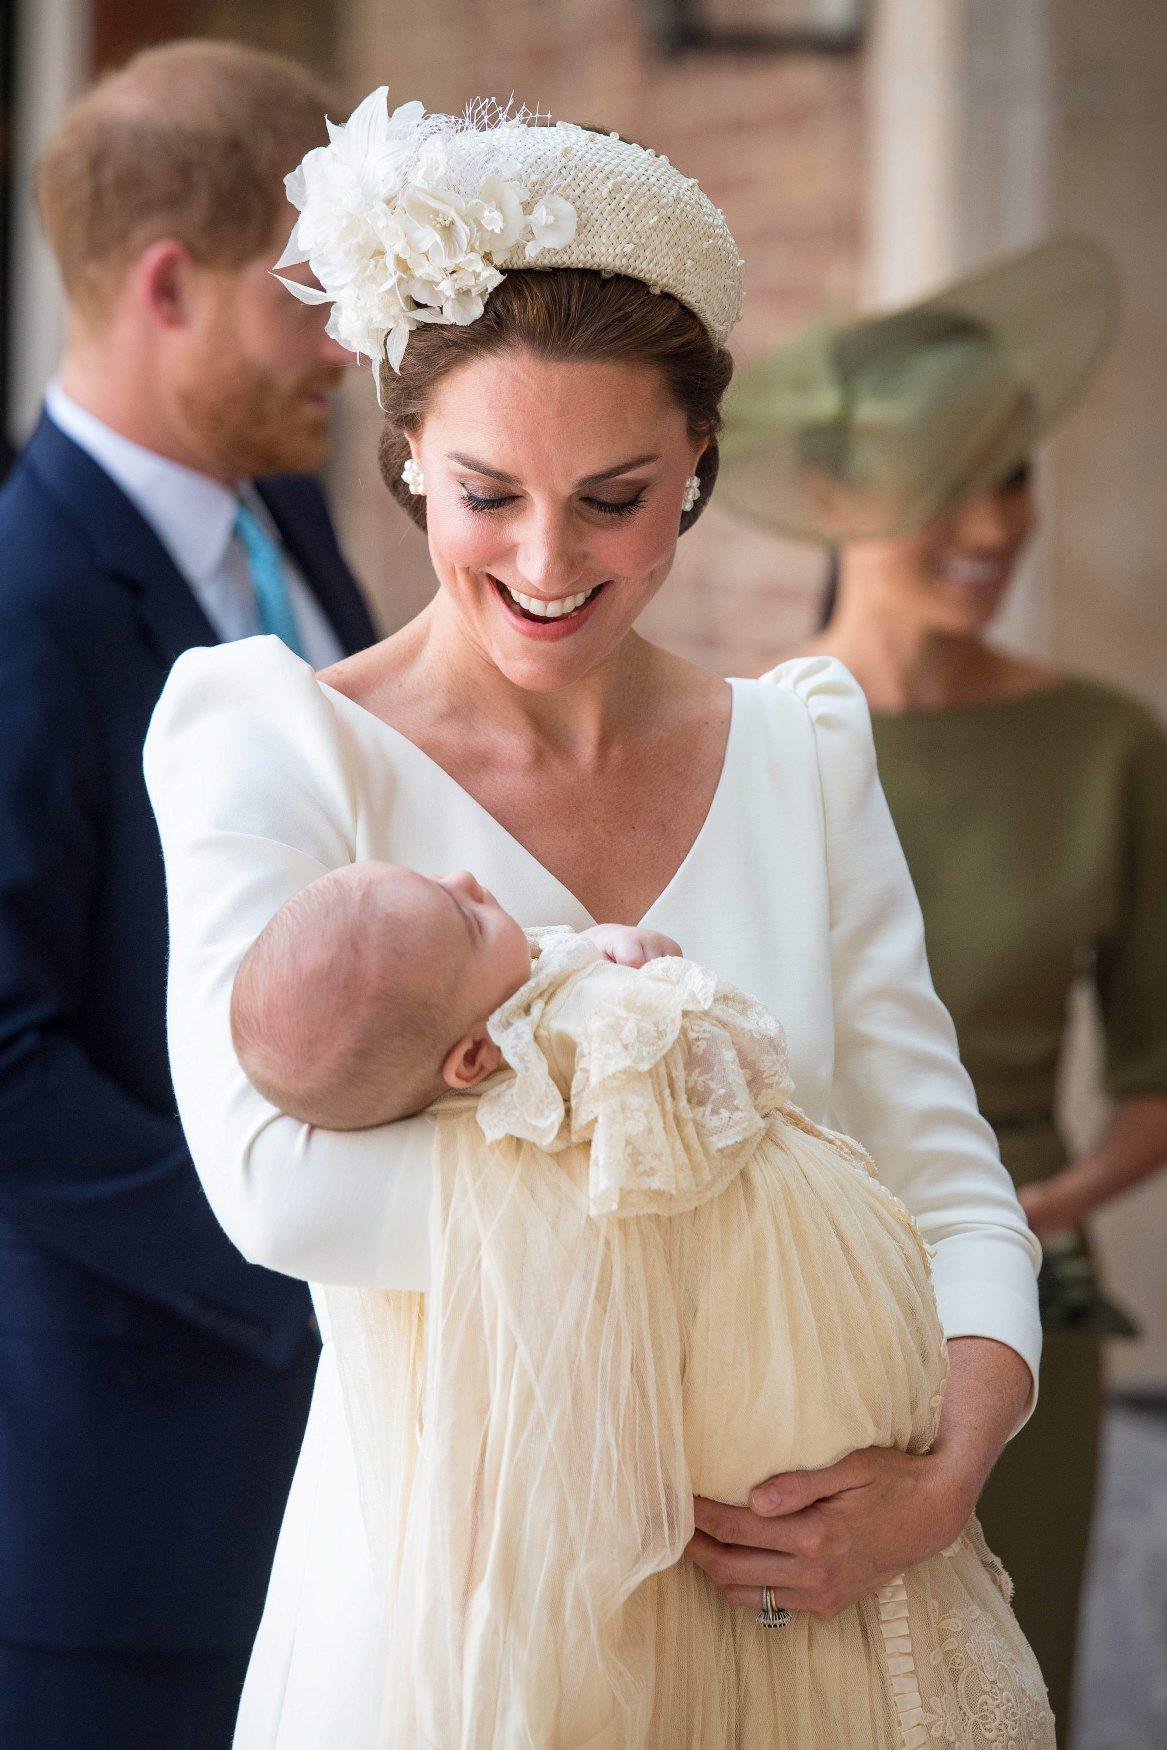 Vojvotkinja Kate s princom Louisom, u pozadini princ Harry i vojvotkinja Meghan